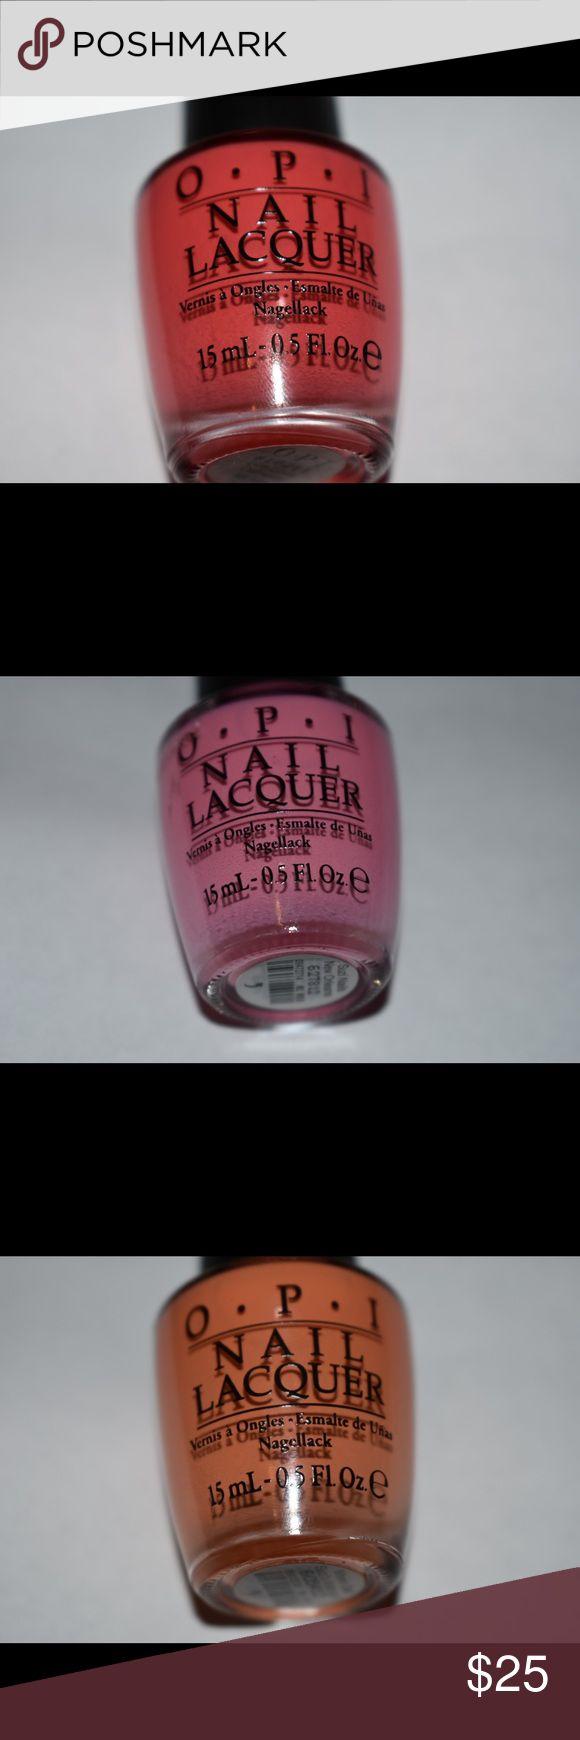 NEW O.P.I. Nail Polish Set NEW  Brand: O.P.I.  Color: Hot & Spicy, Juice Bar Hopping, Where Did Suzi's Man Go?, Live. Love. Carnival, & Suzi Nails New Orleans OPI Makeup